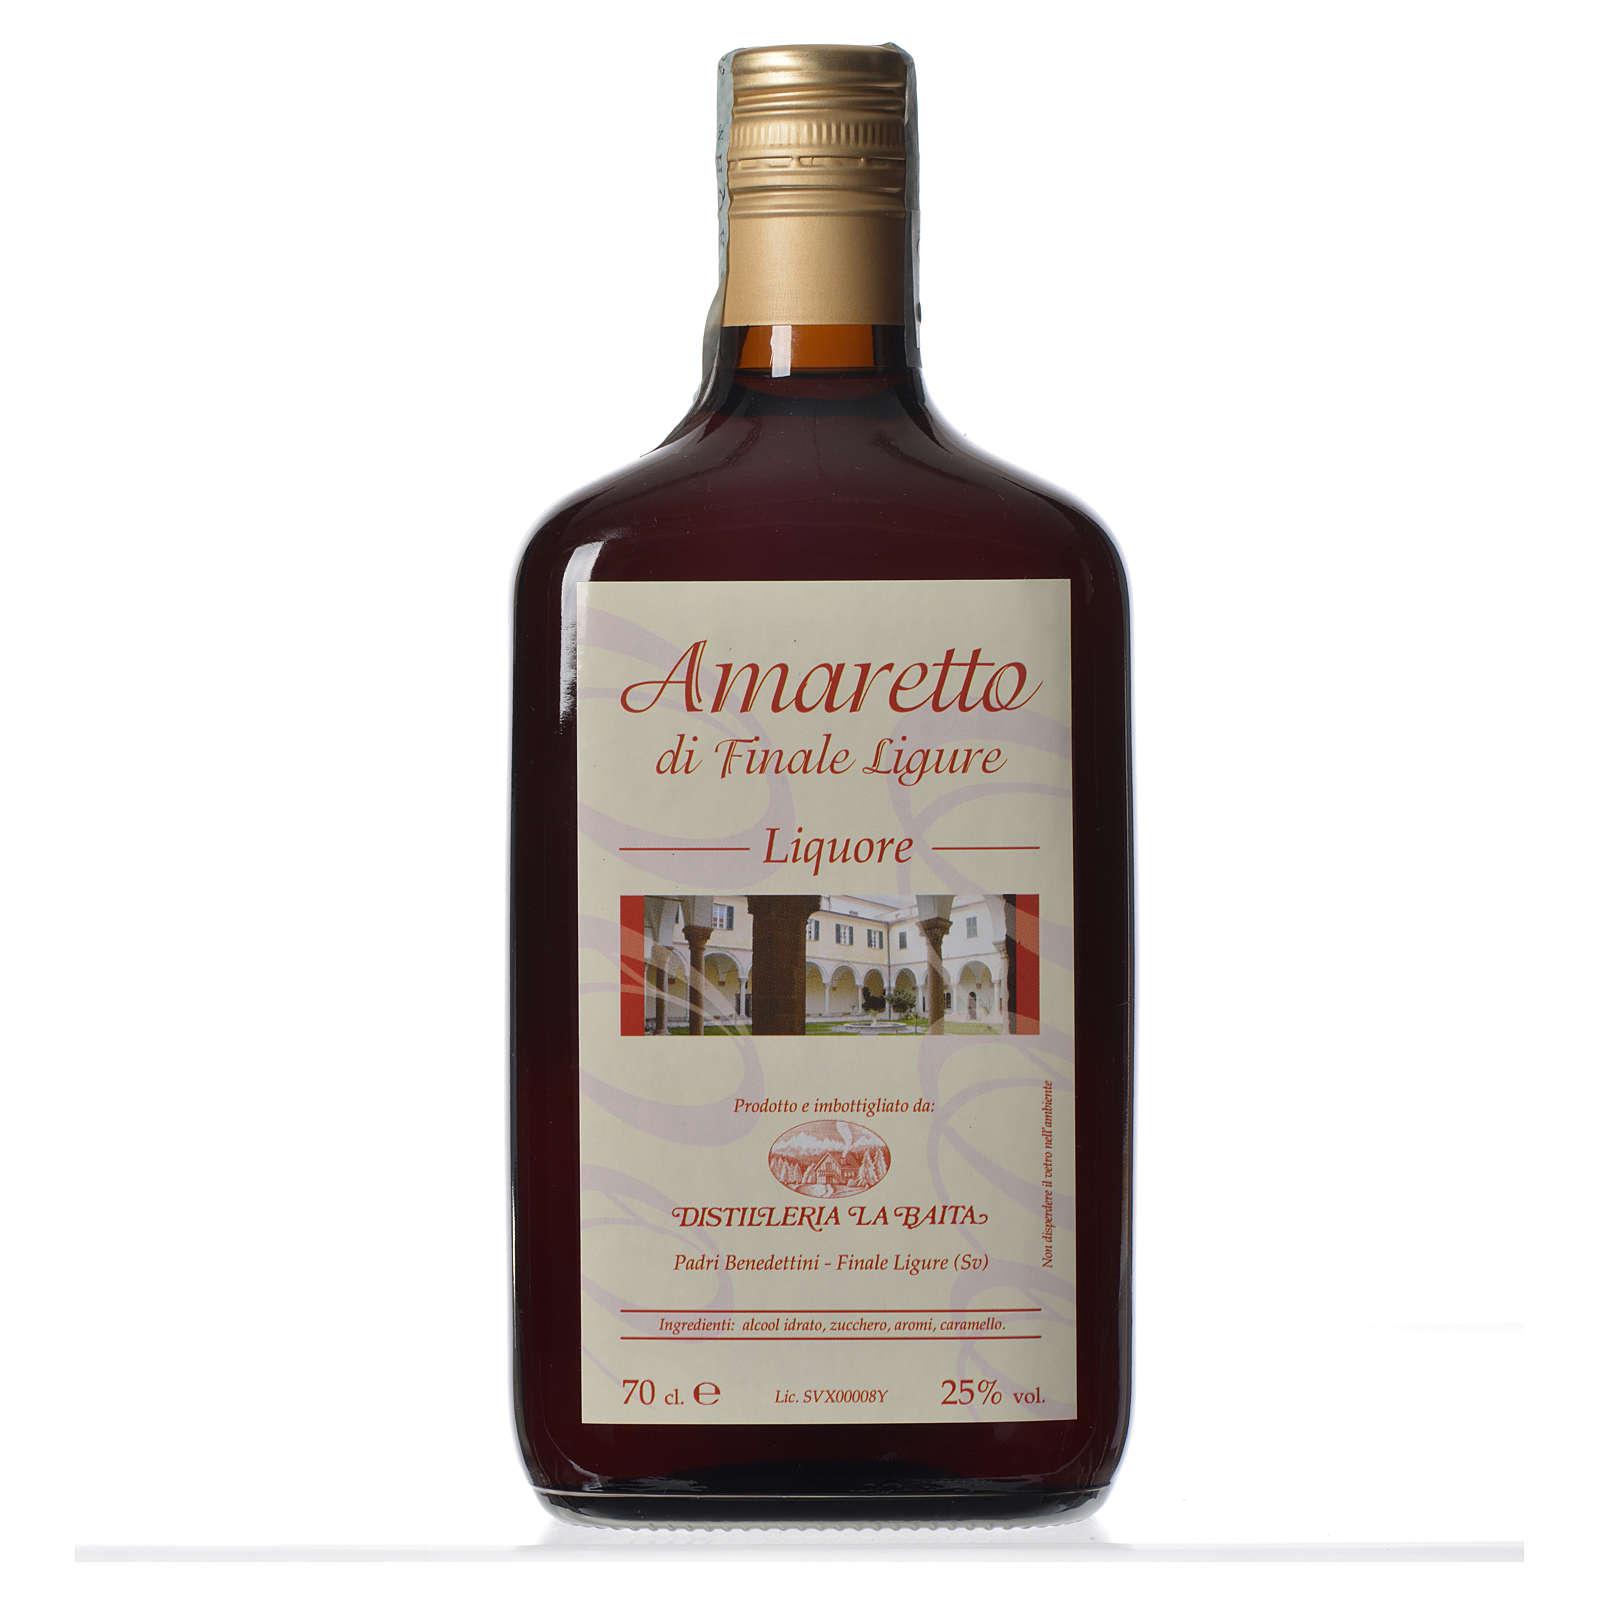 Amaretto de Finale Ligure 700 ml 3